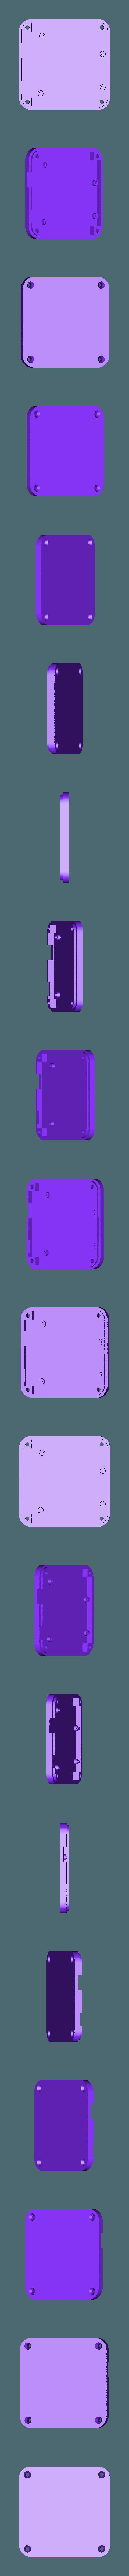 leonardo_case_slim_base.stl Download free STL file 3D Printed Case for Arduino Uno, Leonardo. • 3D printing model, Lassaalk